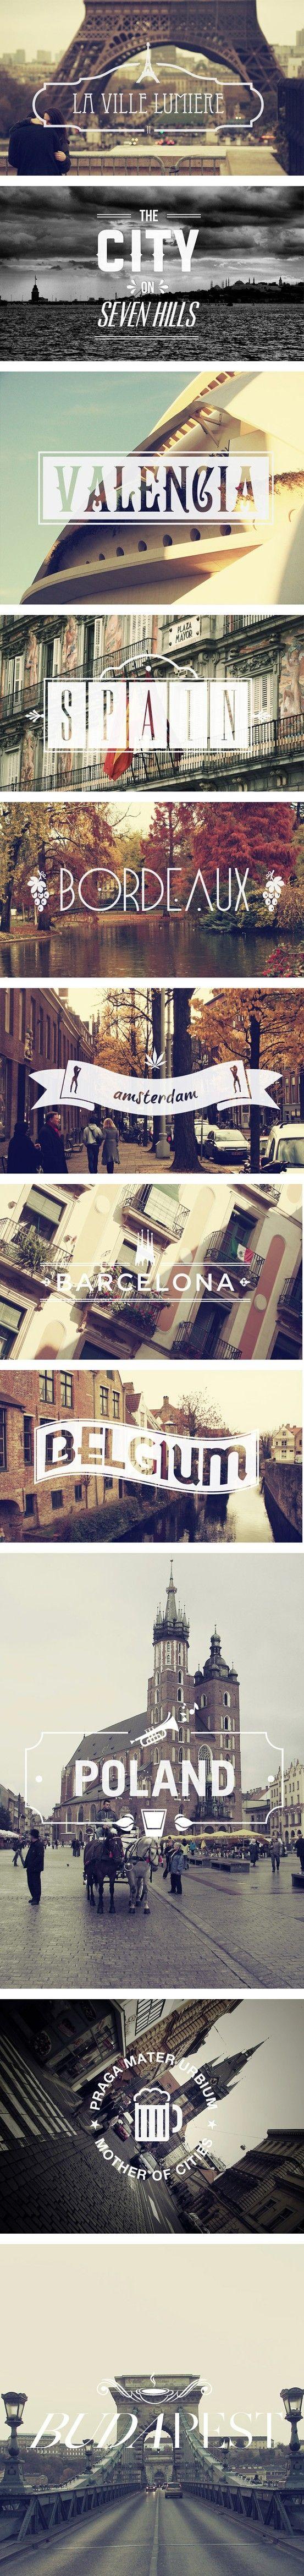 Europe via graphism.fr via indulgy #Travel #Europe #Cities